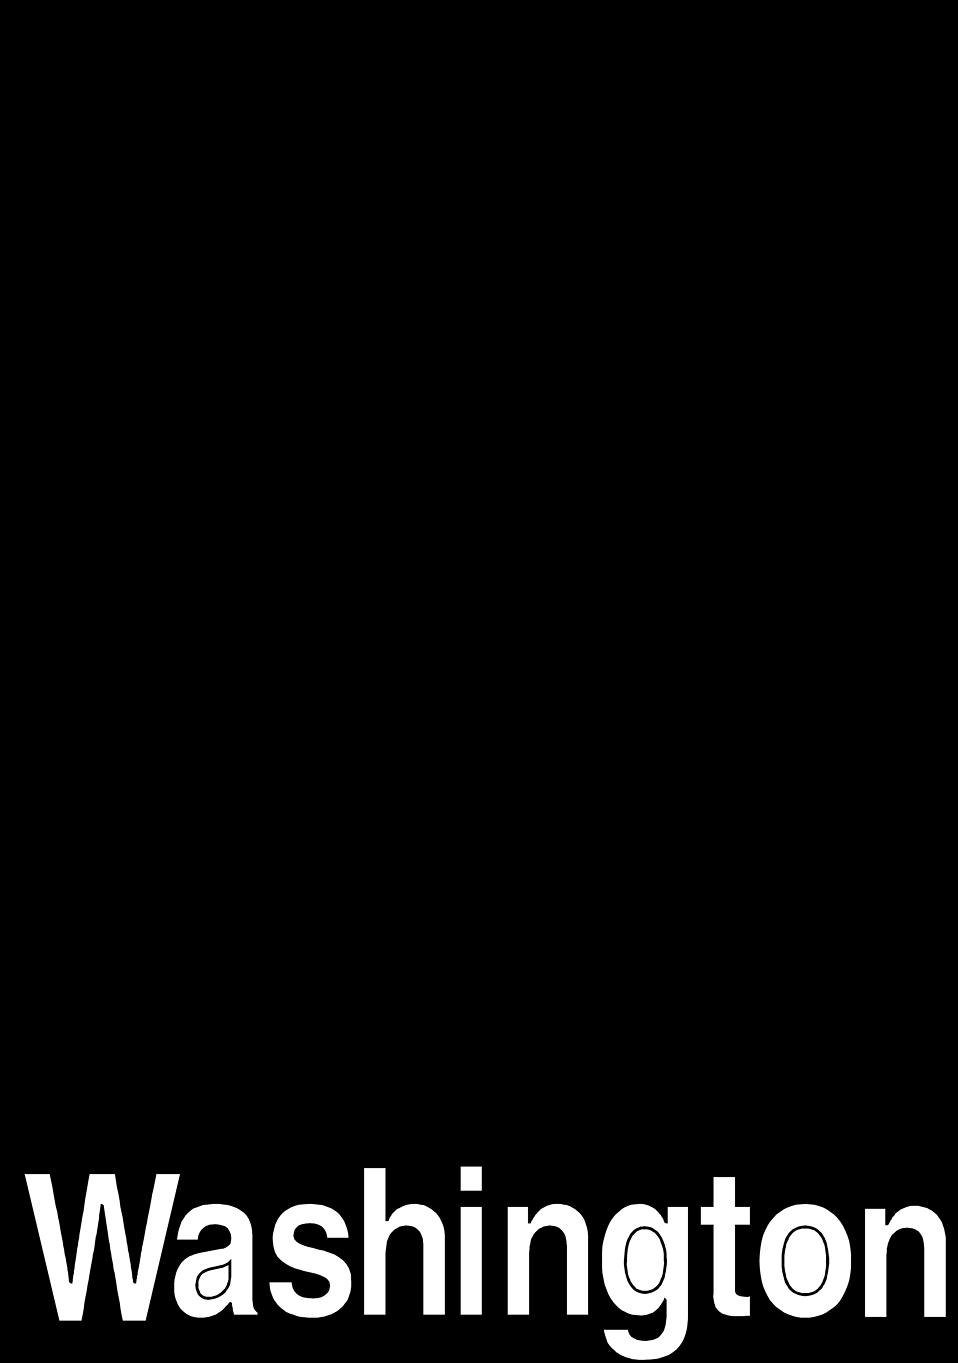 Washington free stock photo. United states clipart silhouette